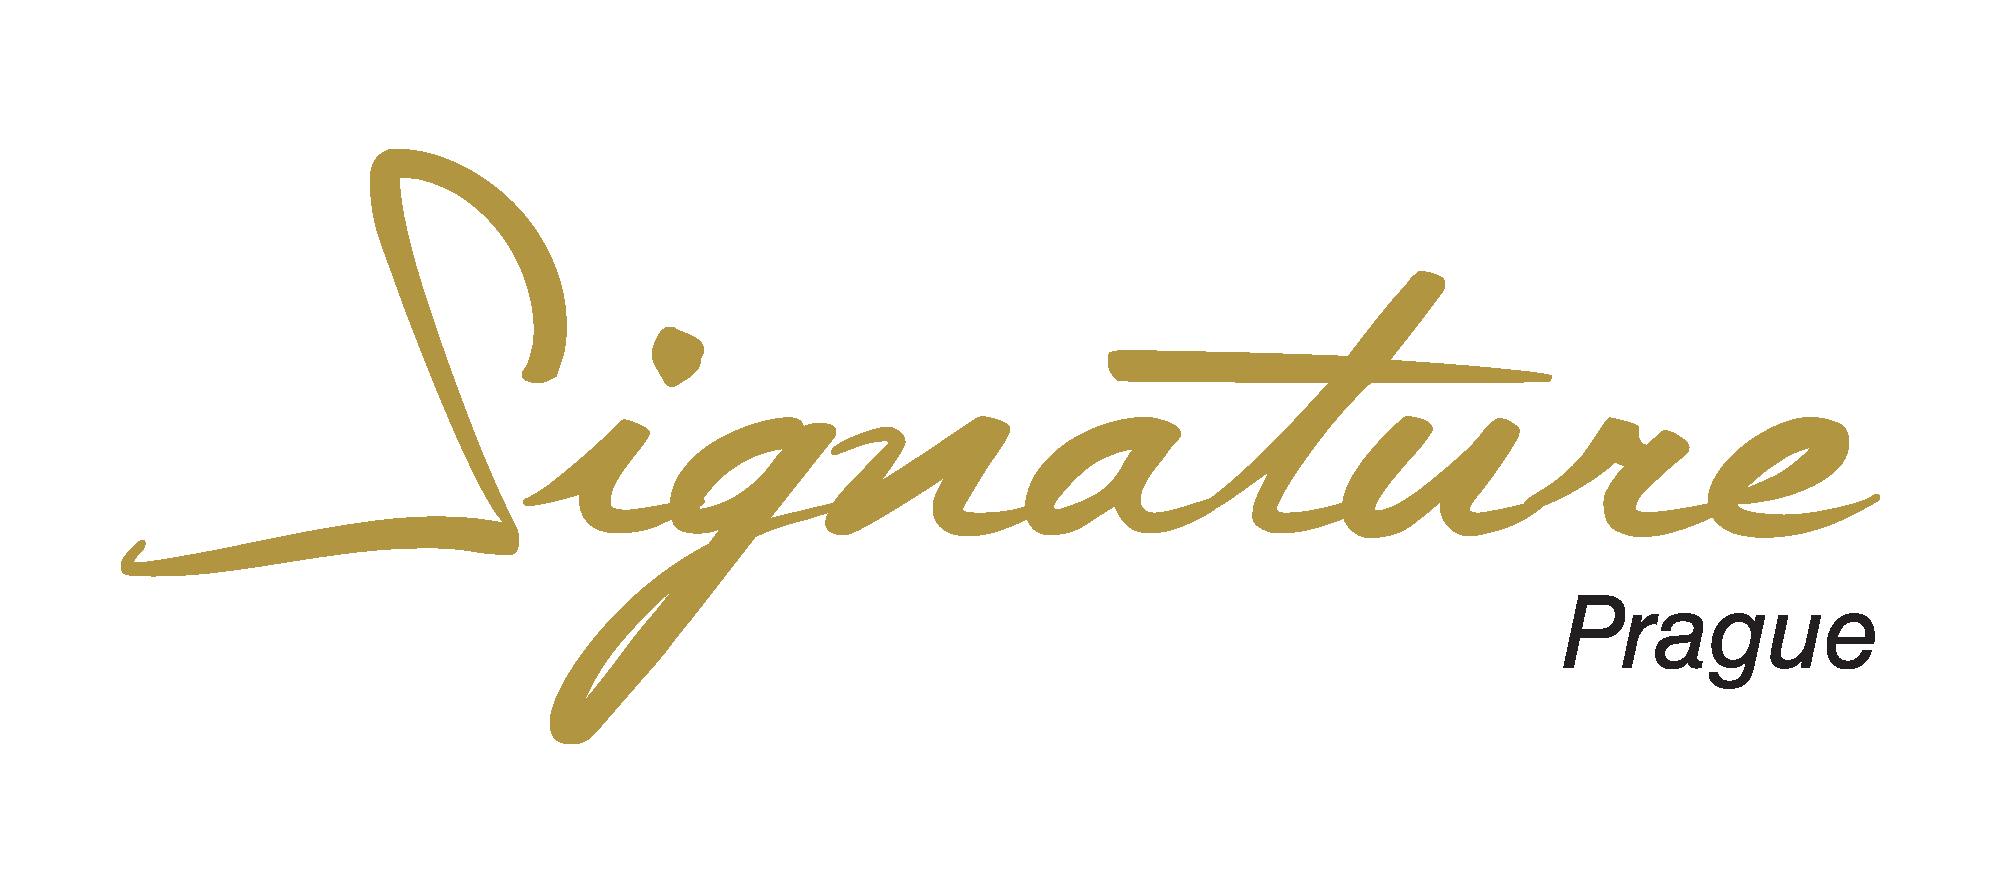 Signature_Prague_TransparentBG.png